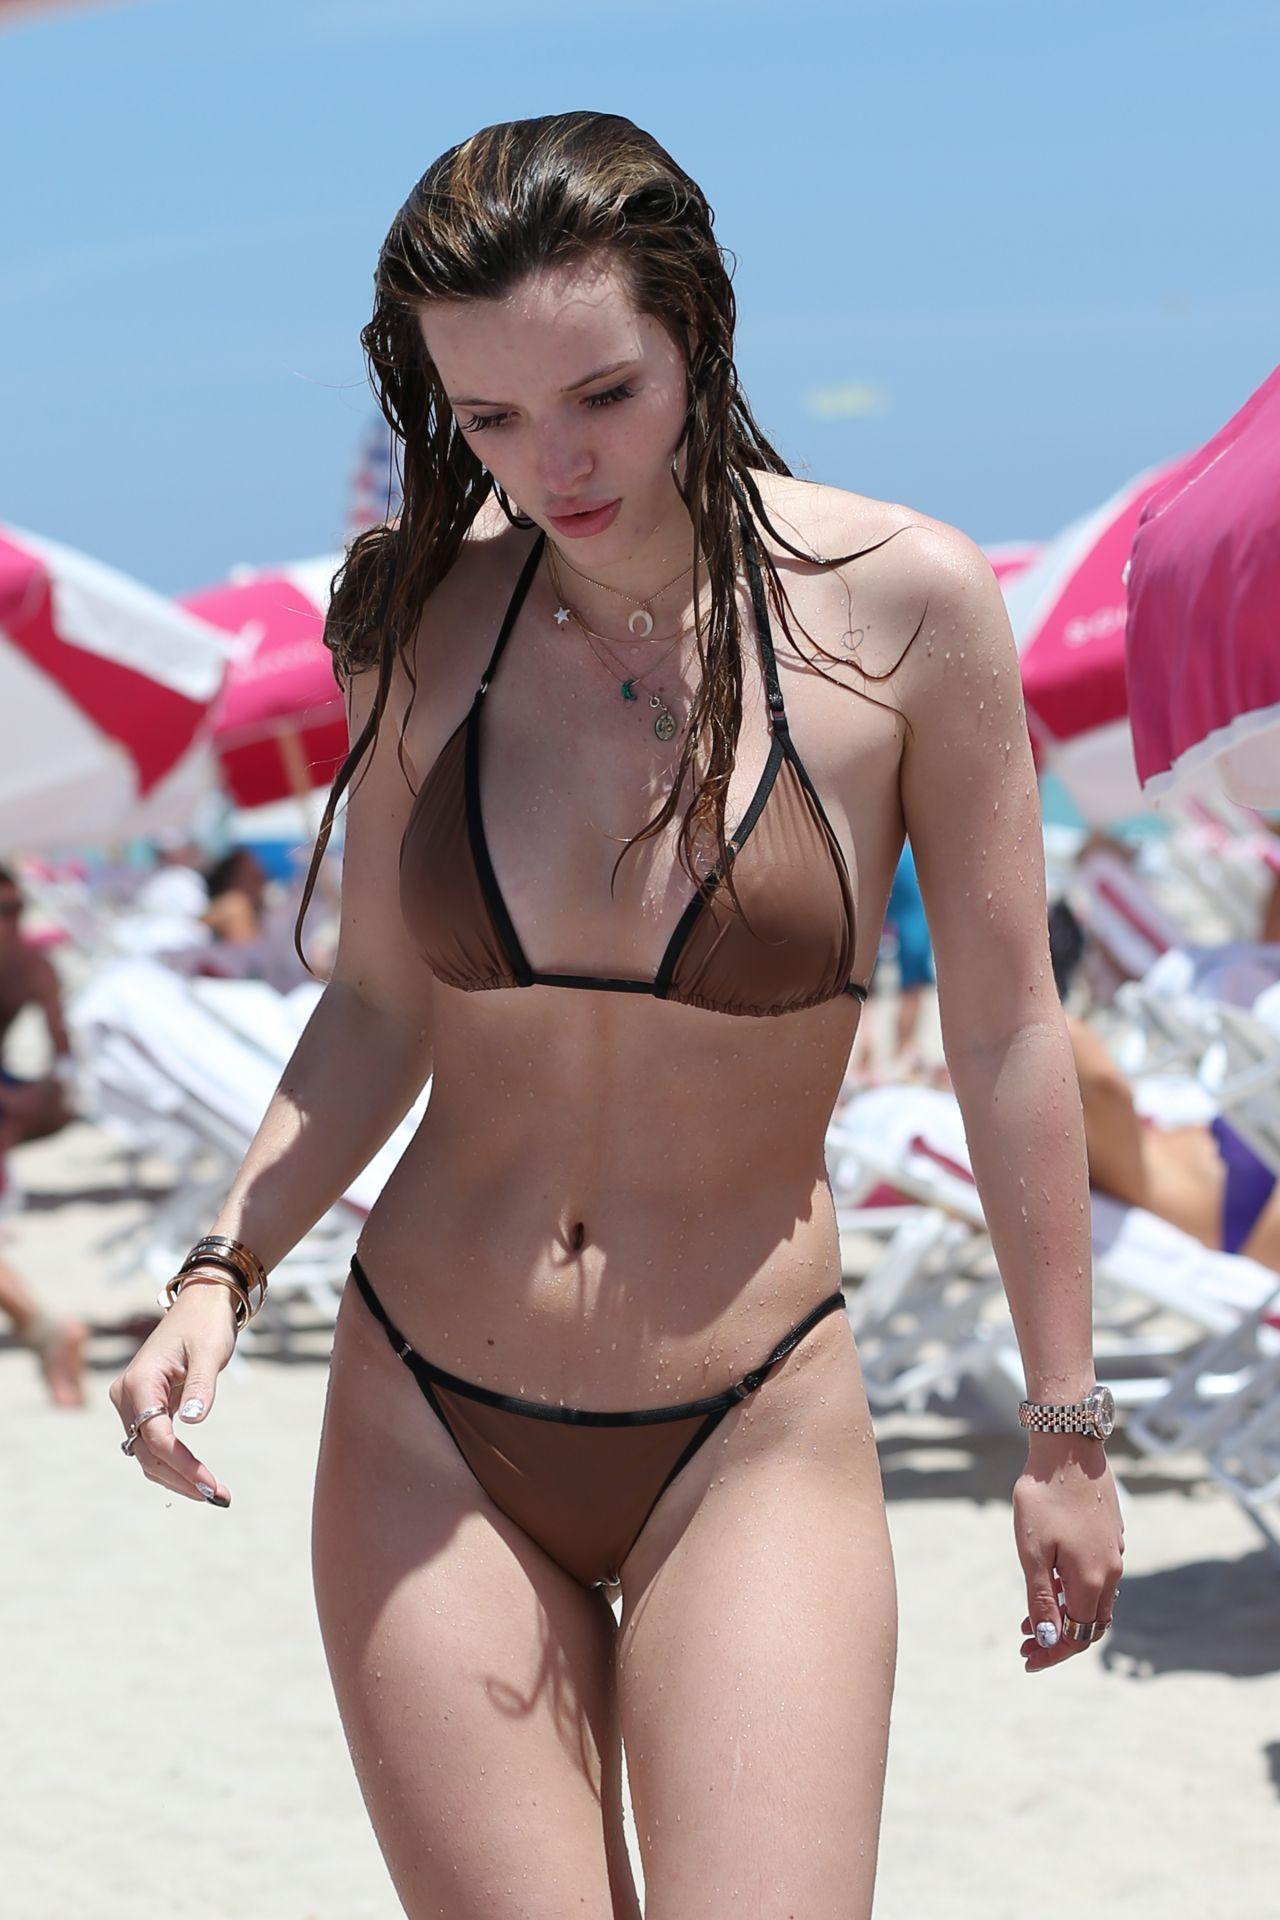 Topless Hot Kaili Thorne naked photo 2017